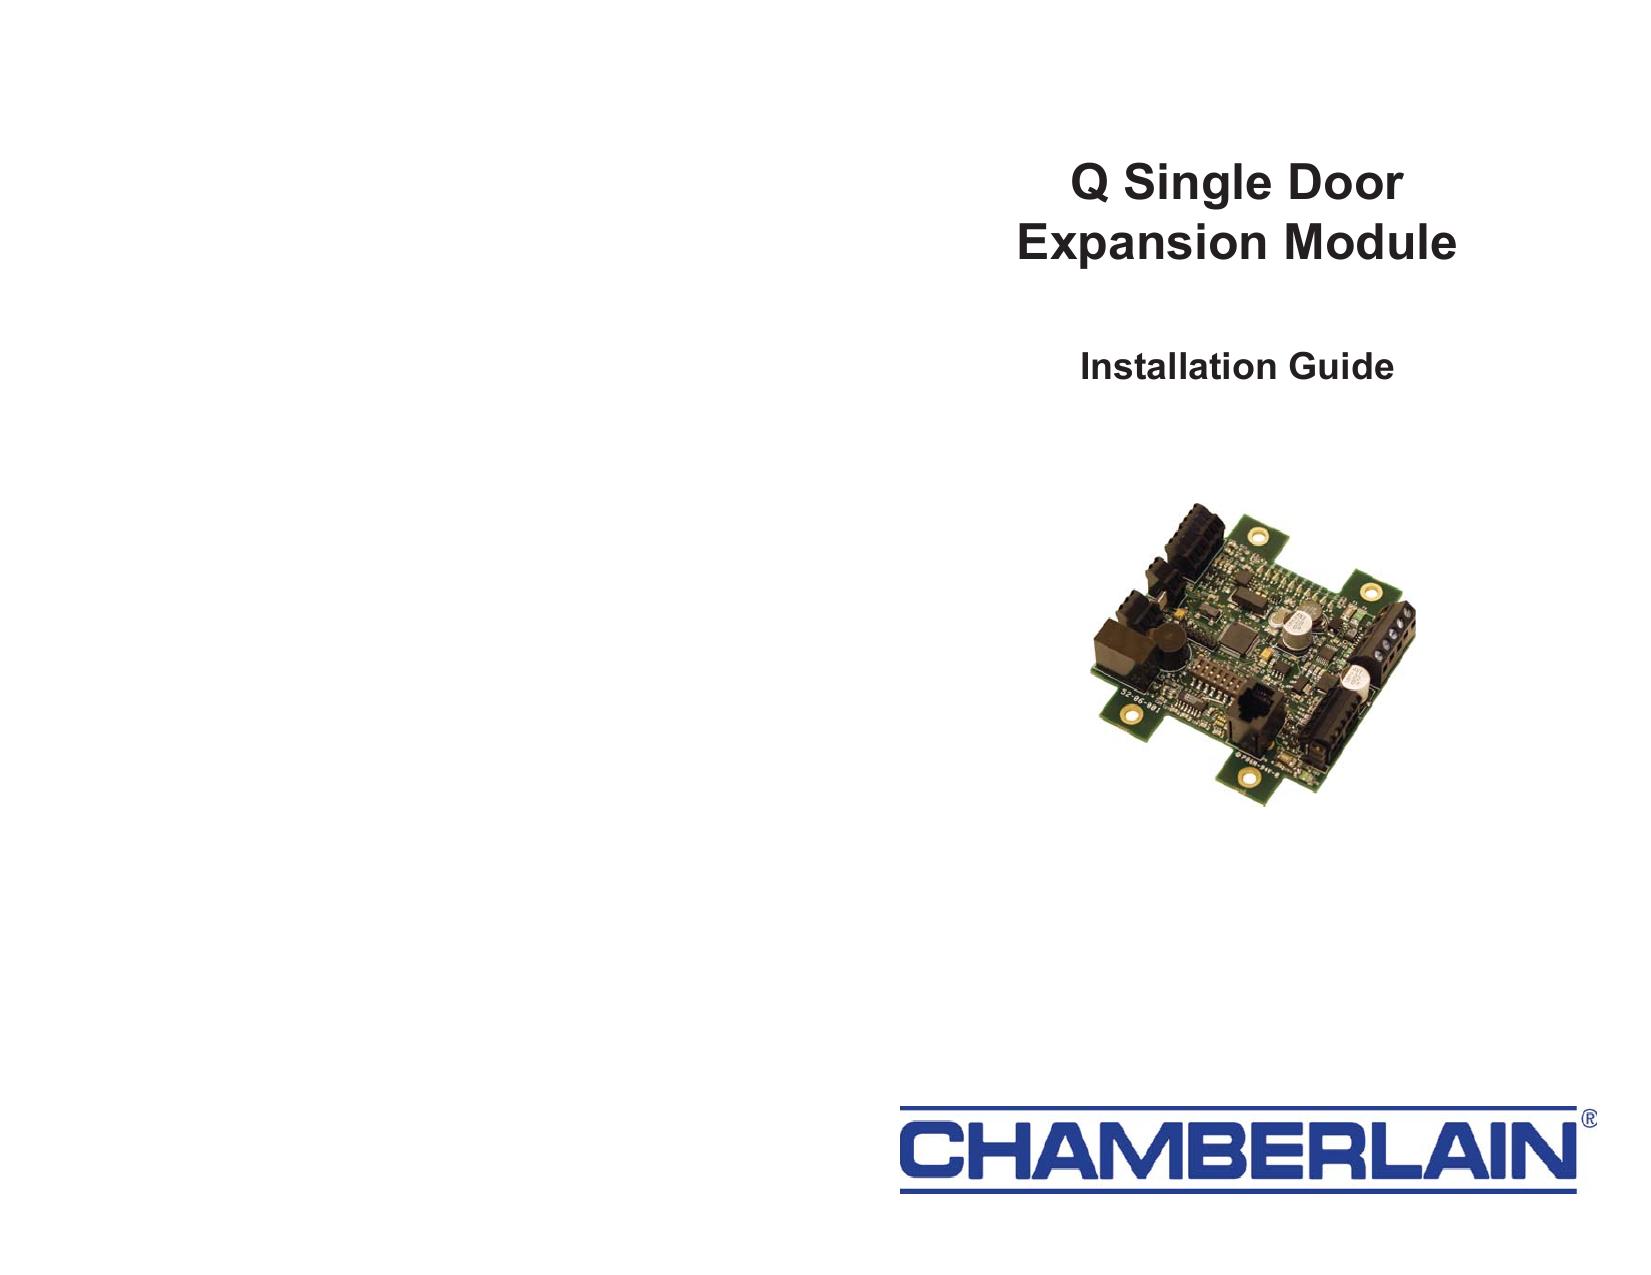 Q Single Door Expansion Module - LiftMaster | manualzz com